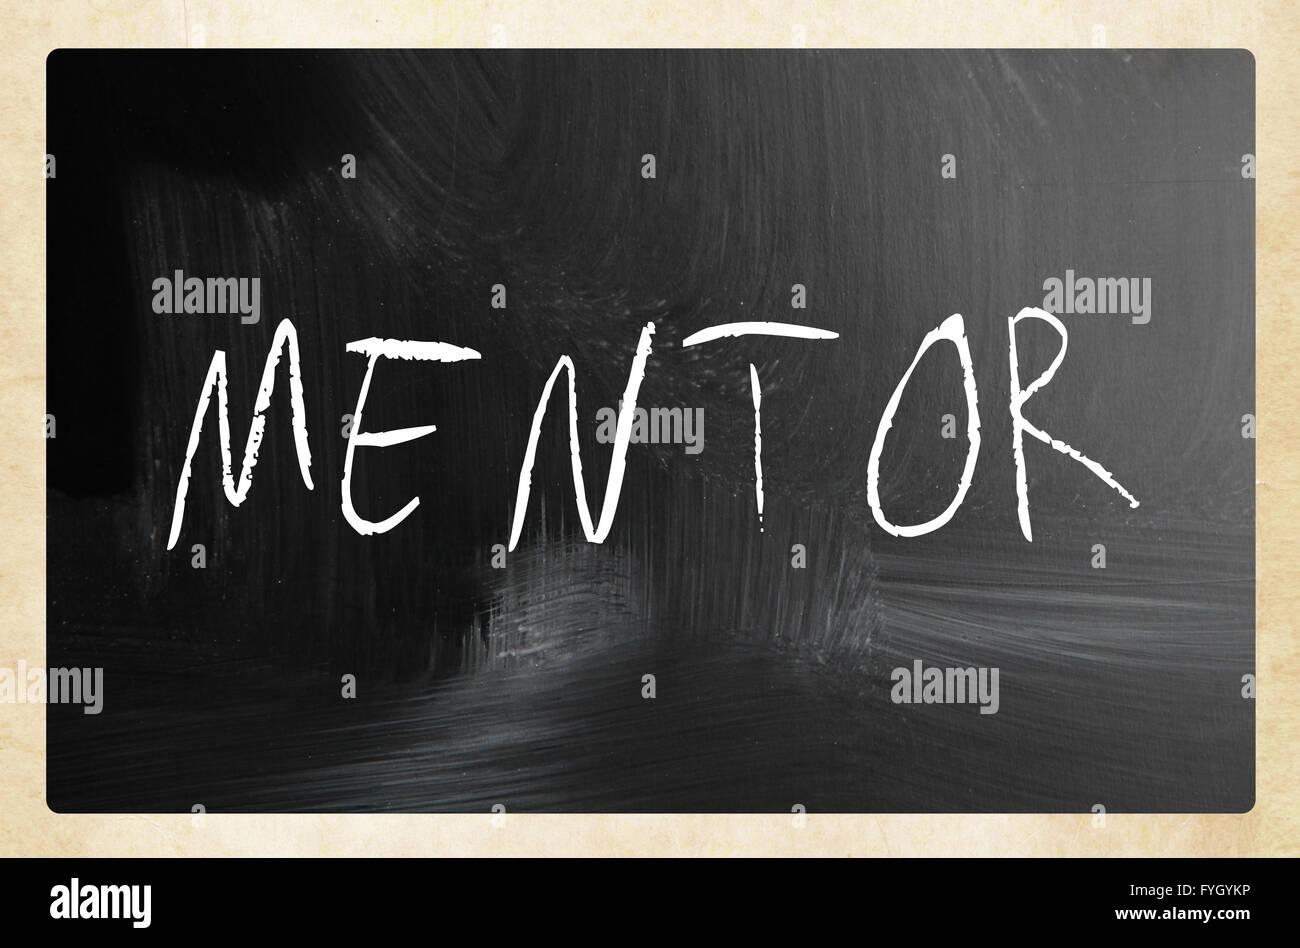 Mentor handwritten with white chalk on a blackboard - Stock Image